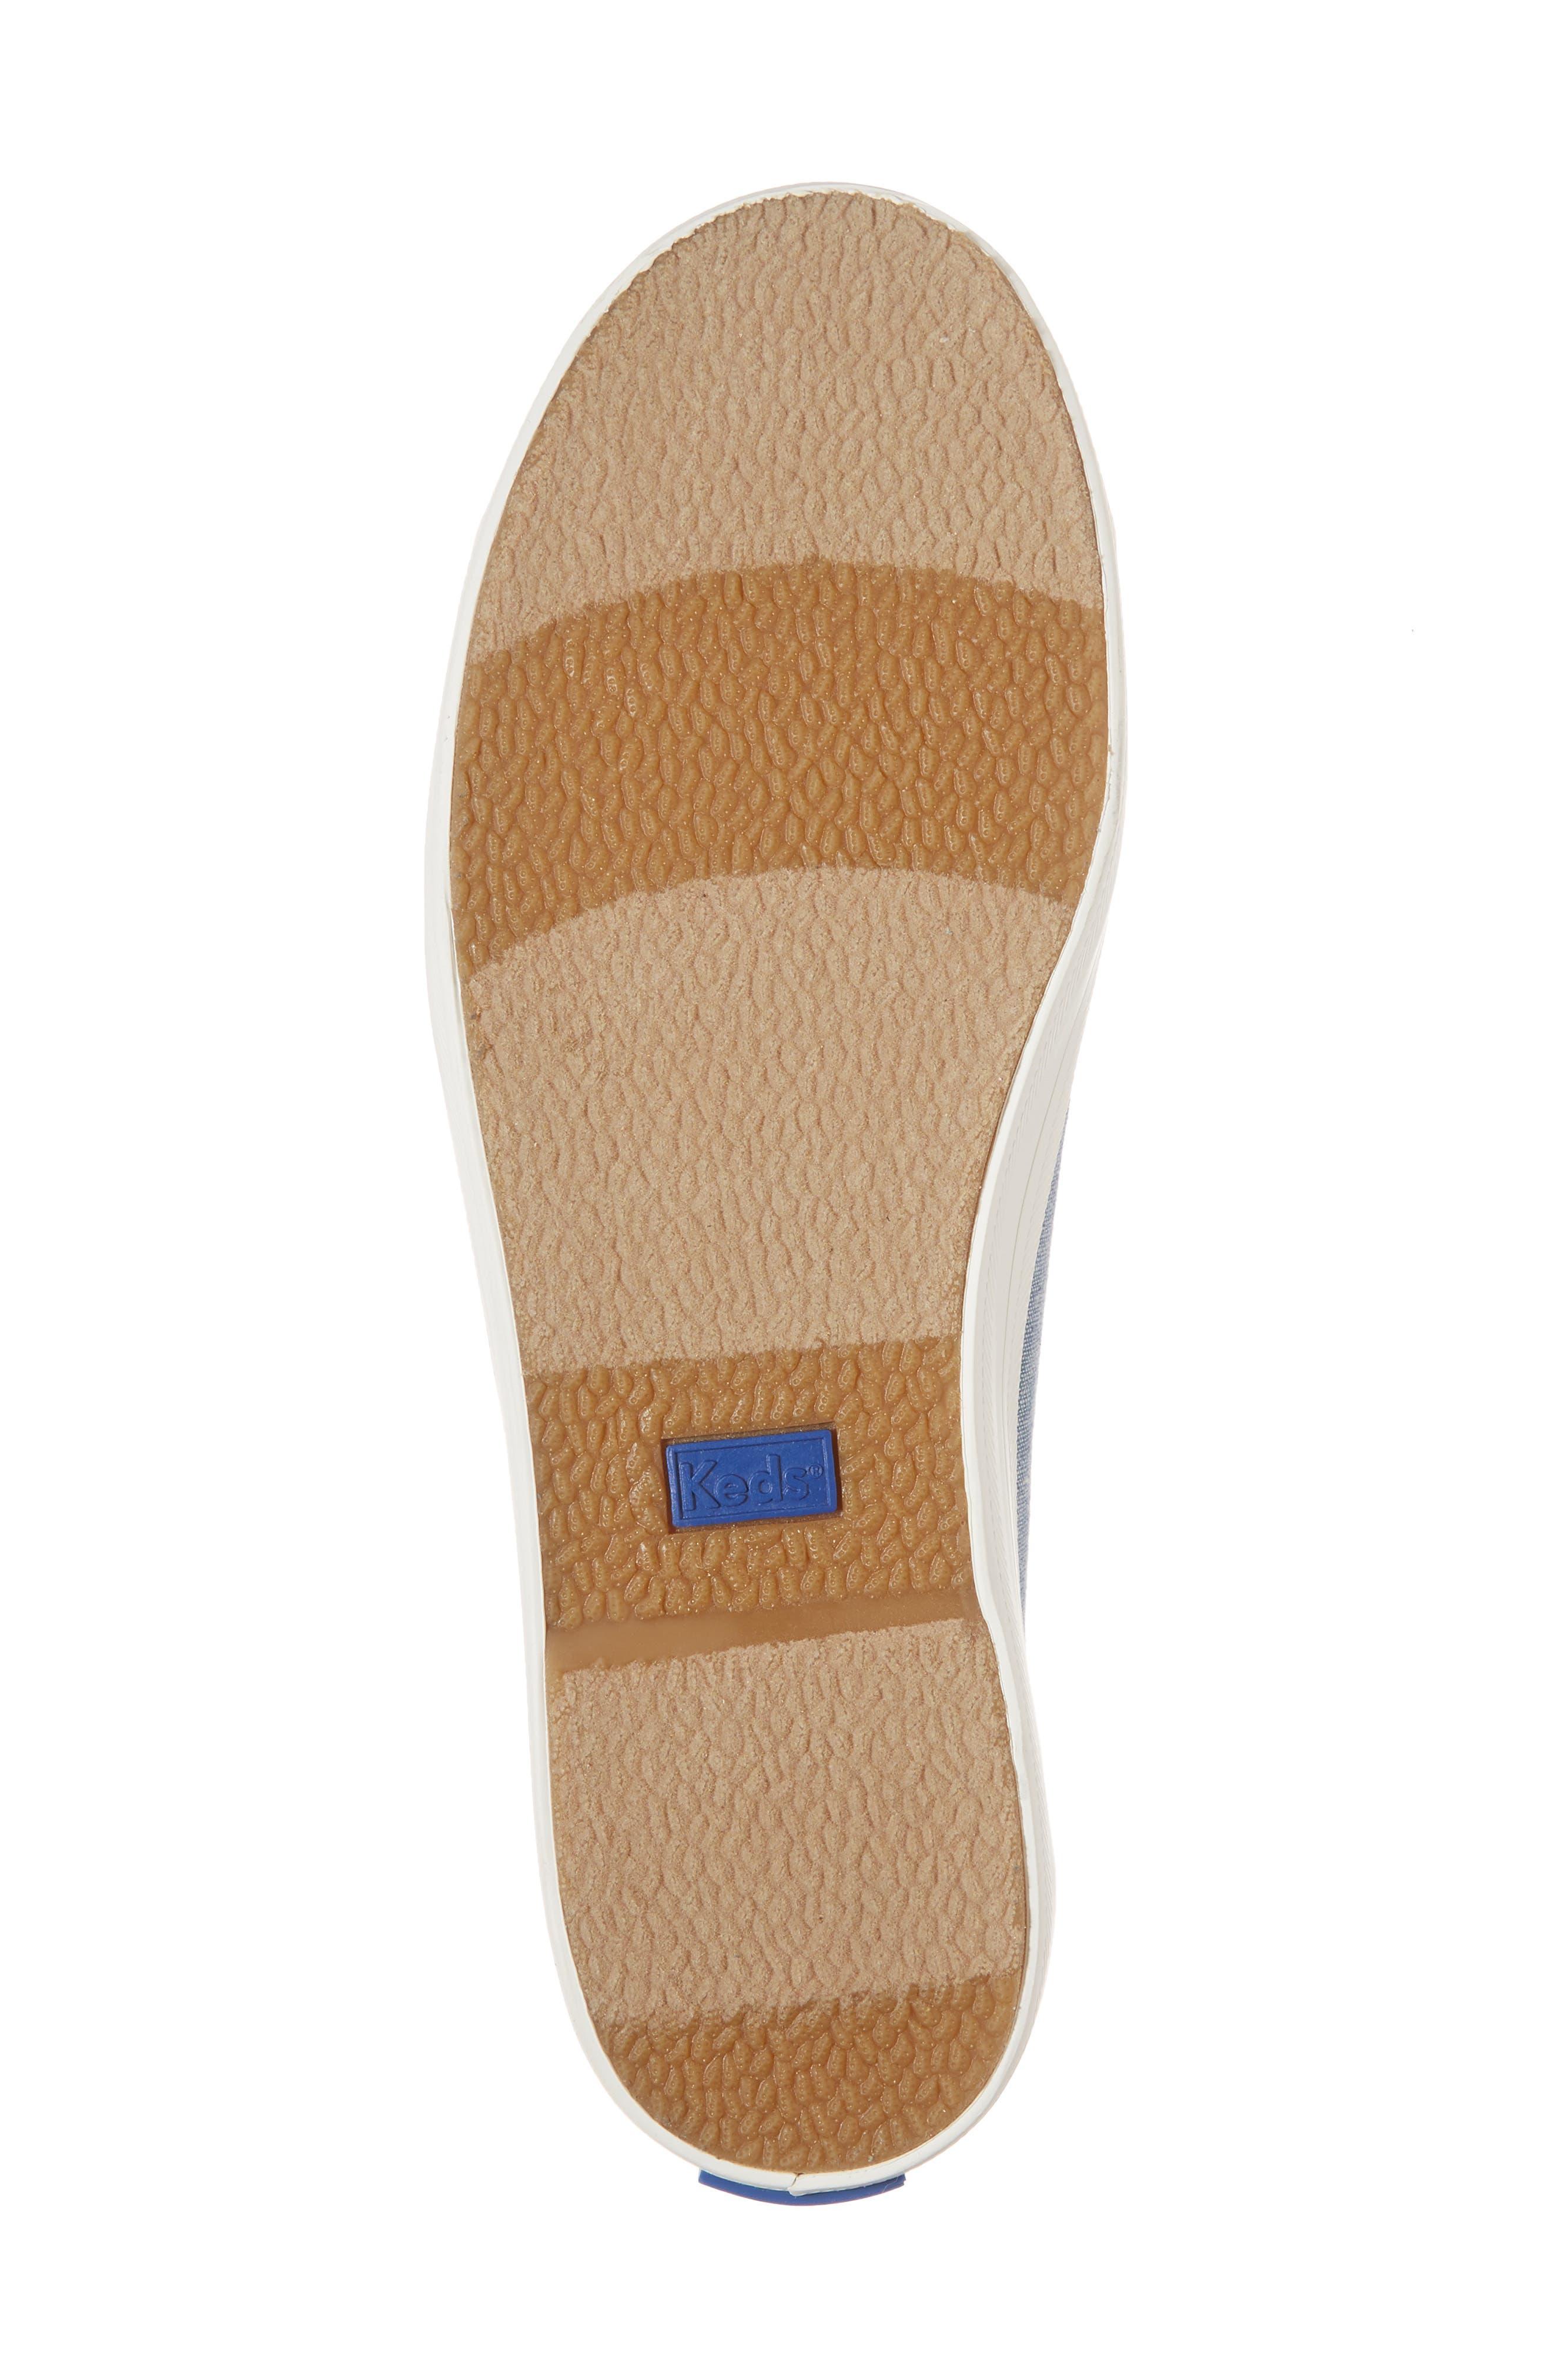 Kickstart Seasonal Solid Sneaker,                             Alternate thumbnail 6, color,                             400